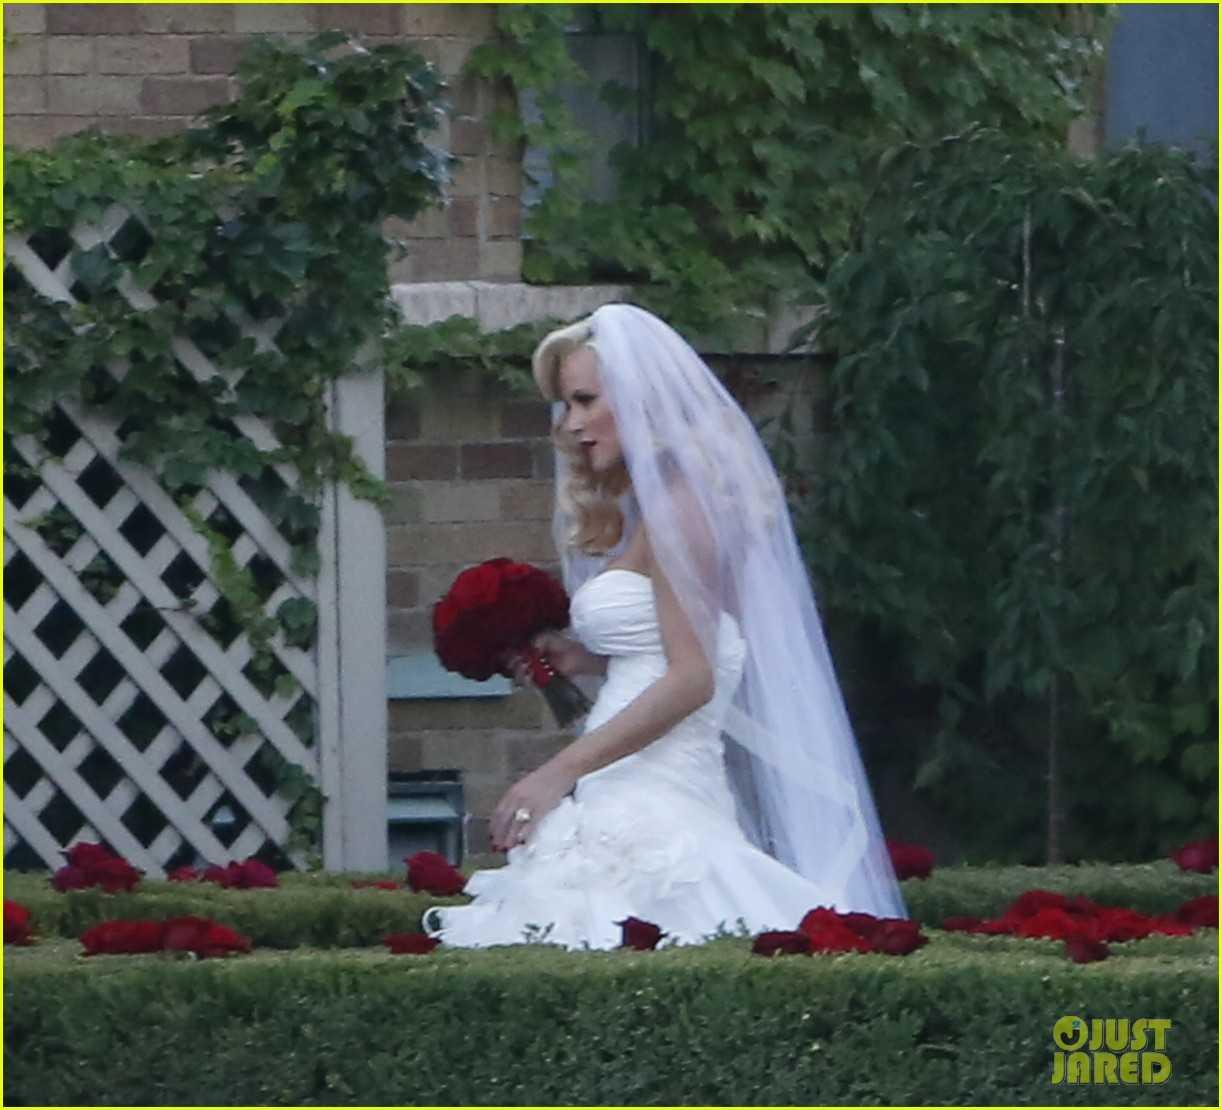 WeddingFeverJennyMccarthyAndAshleeSimpsonSayIDo